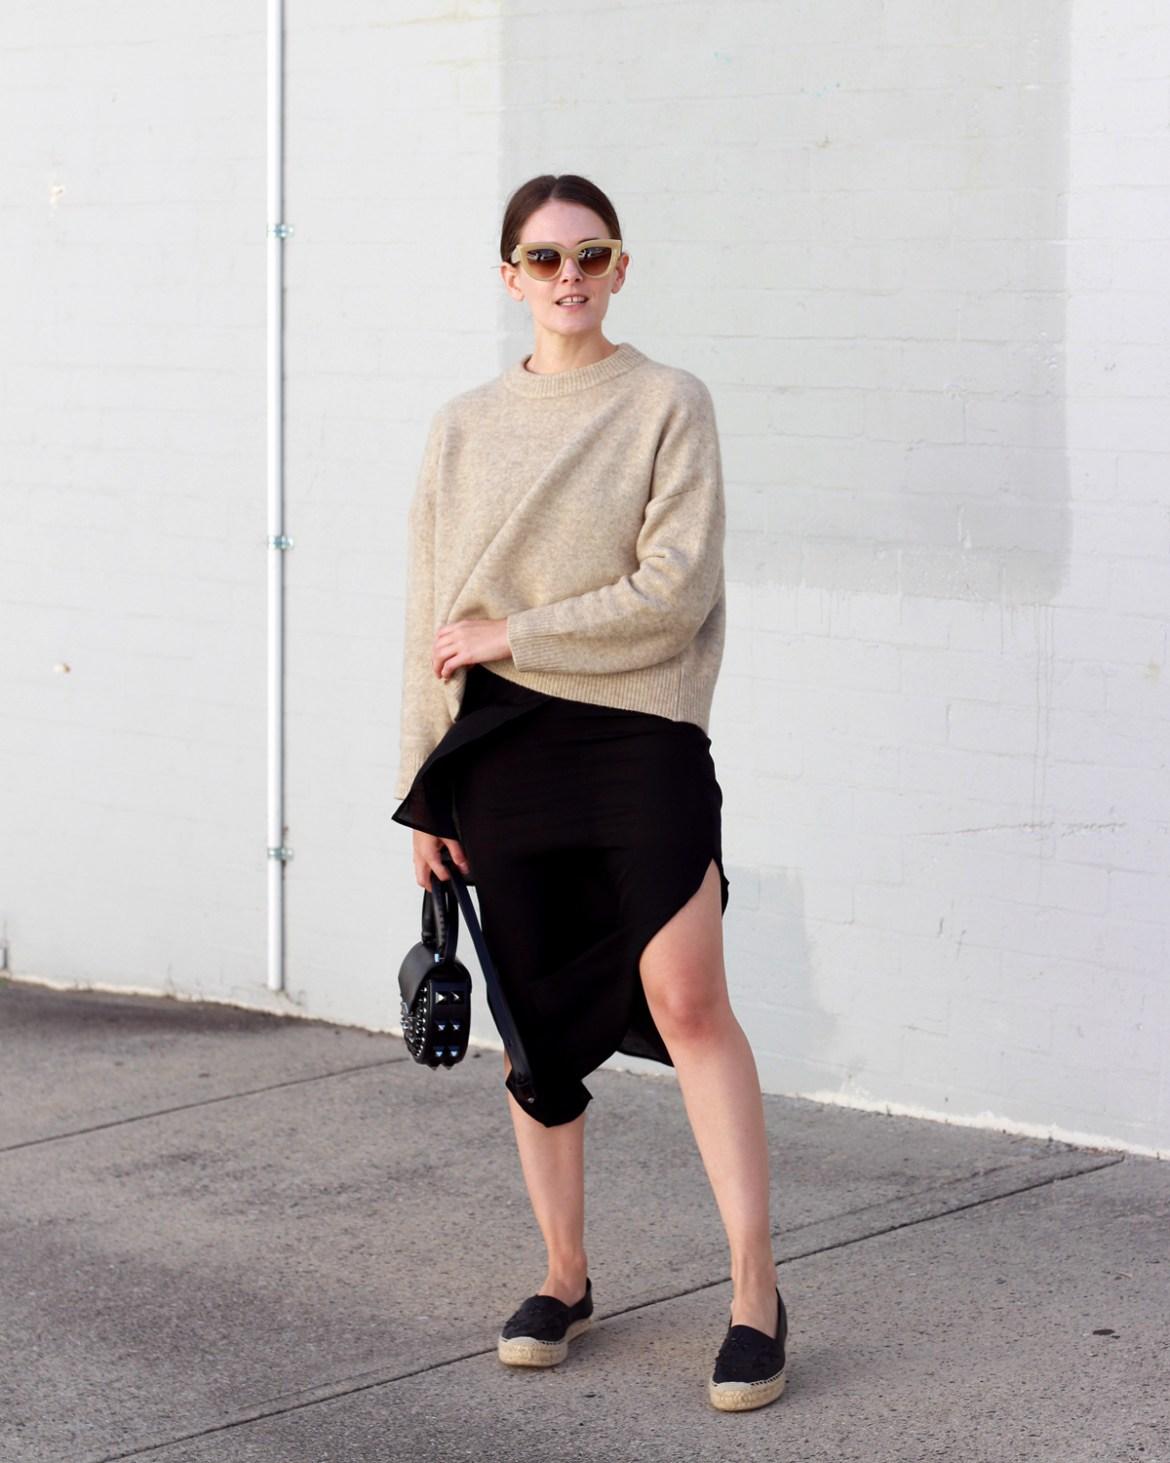 Jac + Jack softest knit worn with Salar Milano bag, espadrilles and black slip dress by Inspiring Wit fashion blogger Jenelle